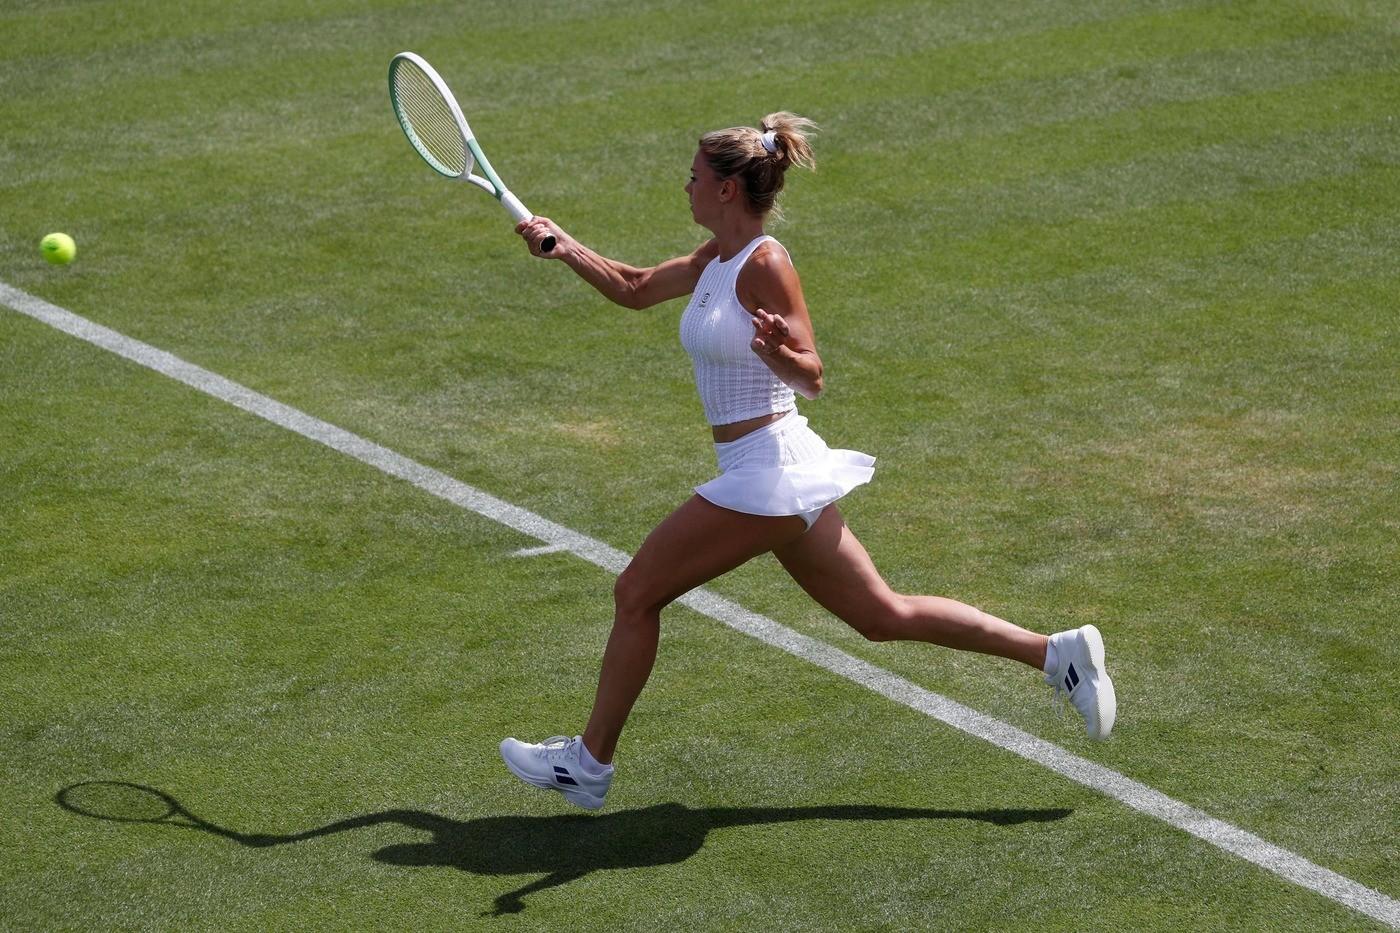 Wimbledon, Camila Giorgi subito eliminata. Impresa di Fabbiano